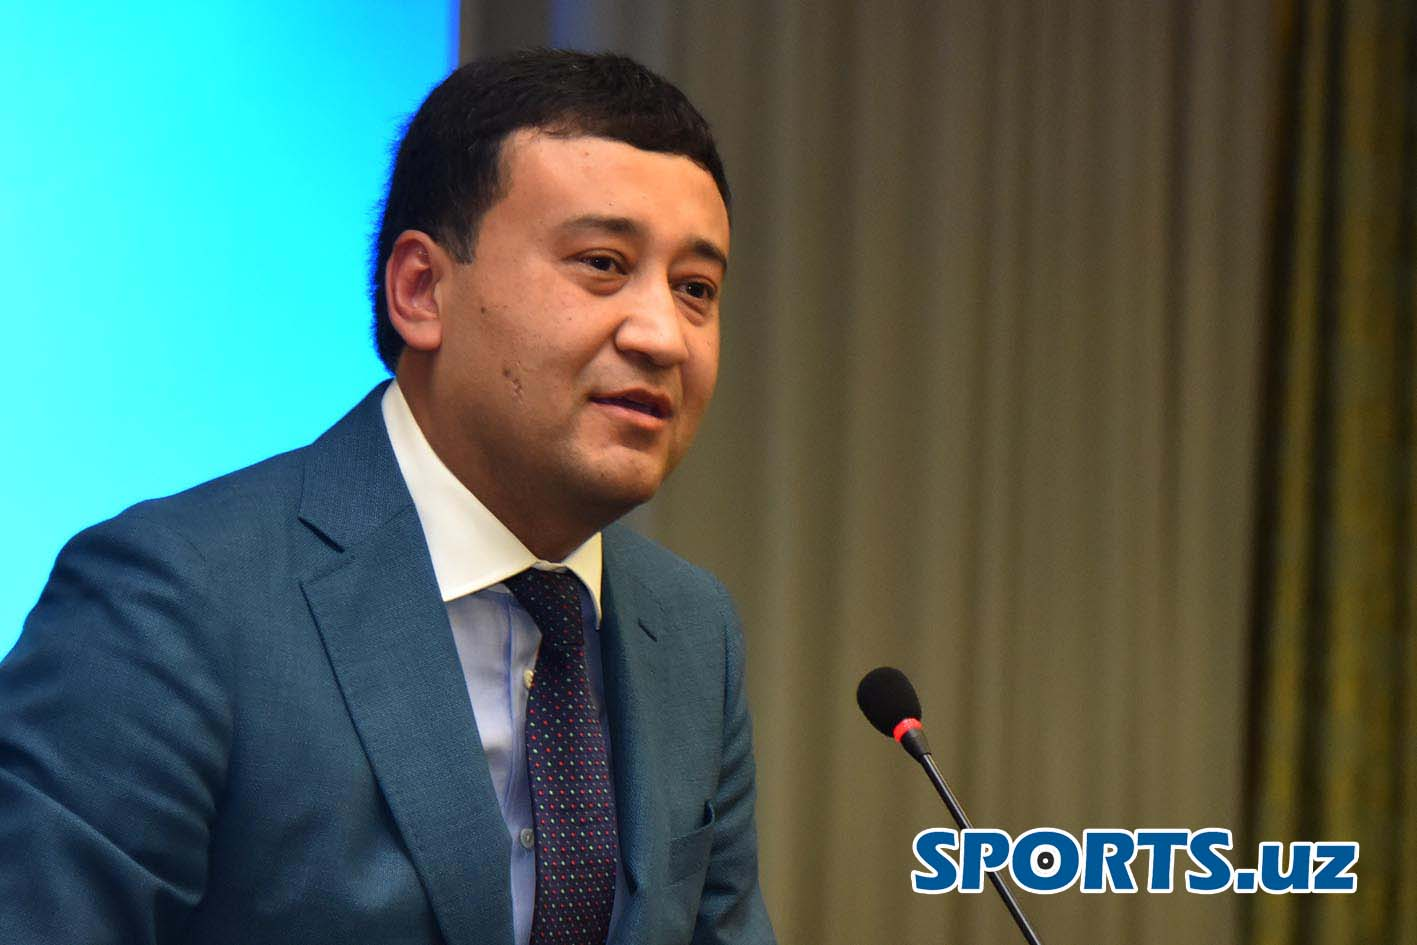 ahmadjonov sports